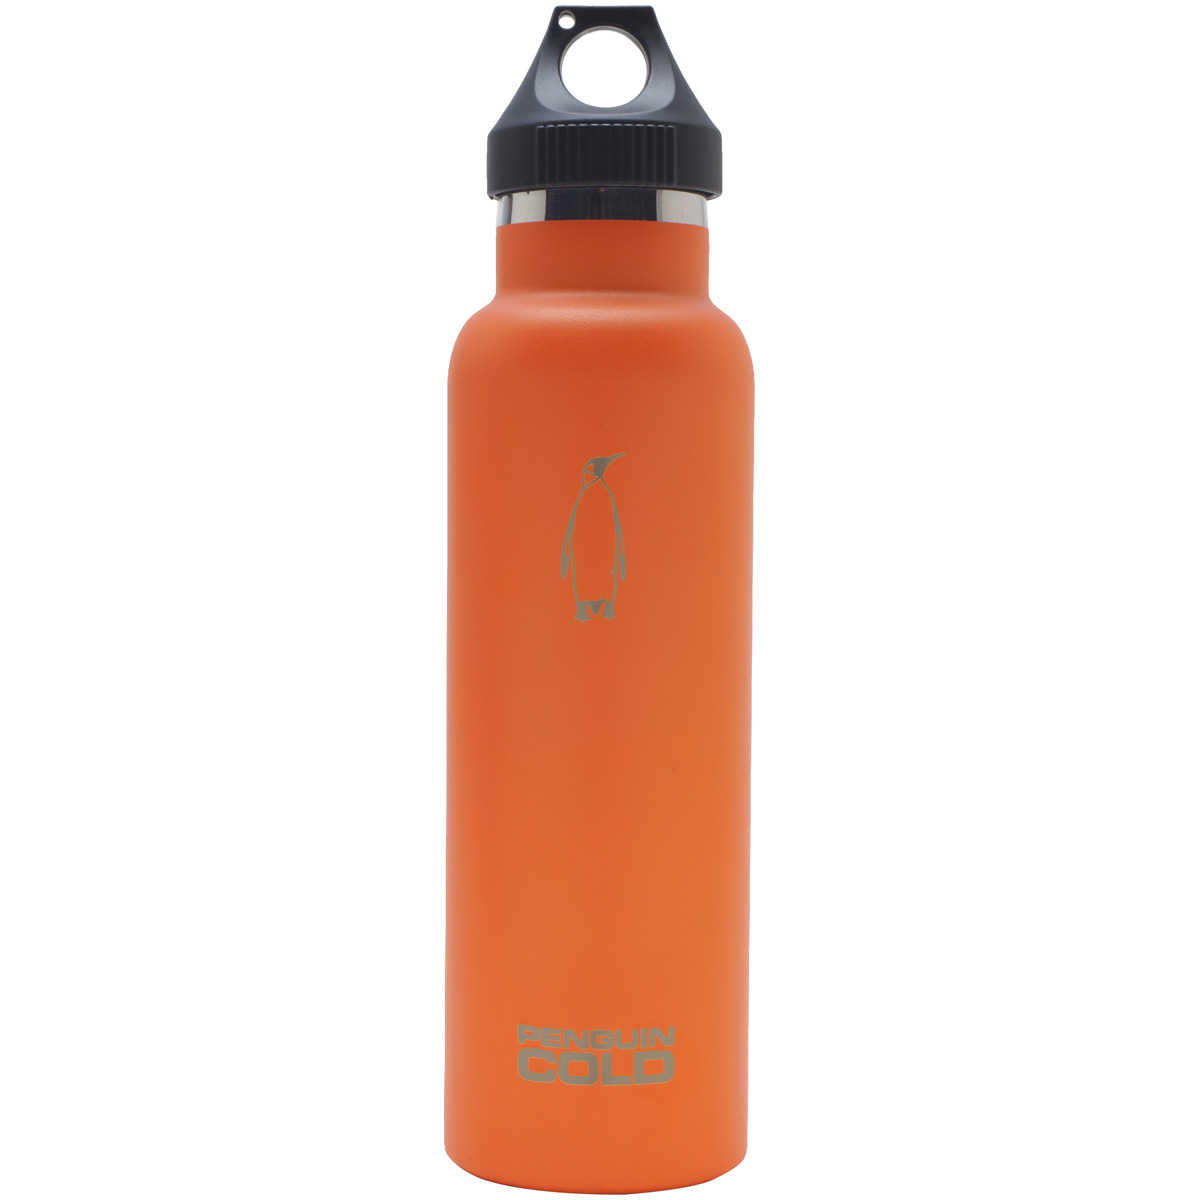 Standard Penguin 21oz. Handle lid ボトル